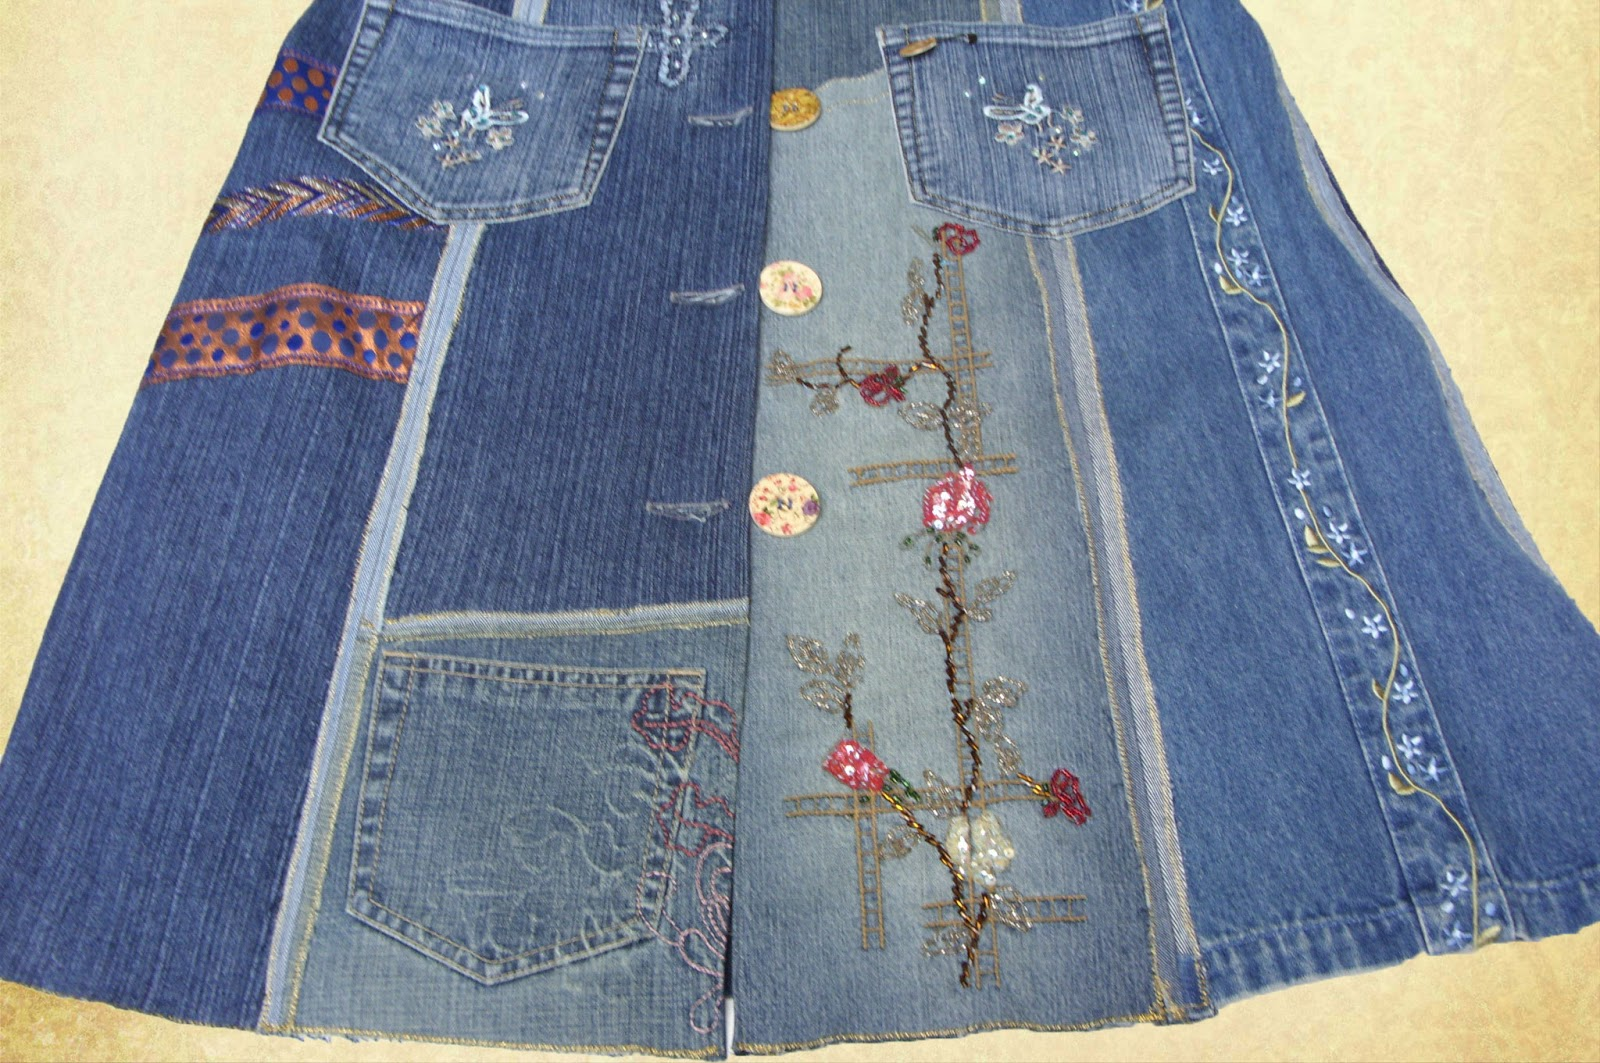 willkommen bei frauhohmann jeansmantel aus alten jeans. Black Bedroom Furniture Sets. Home Design Ideas